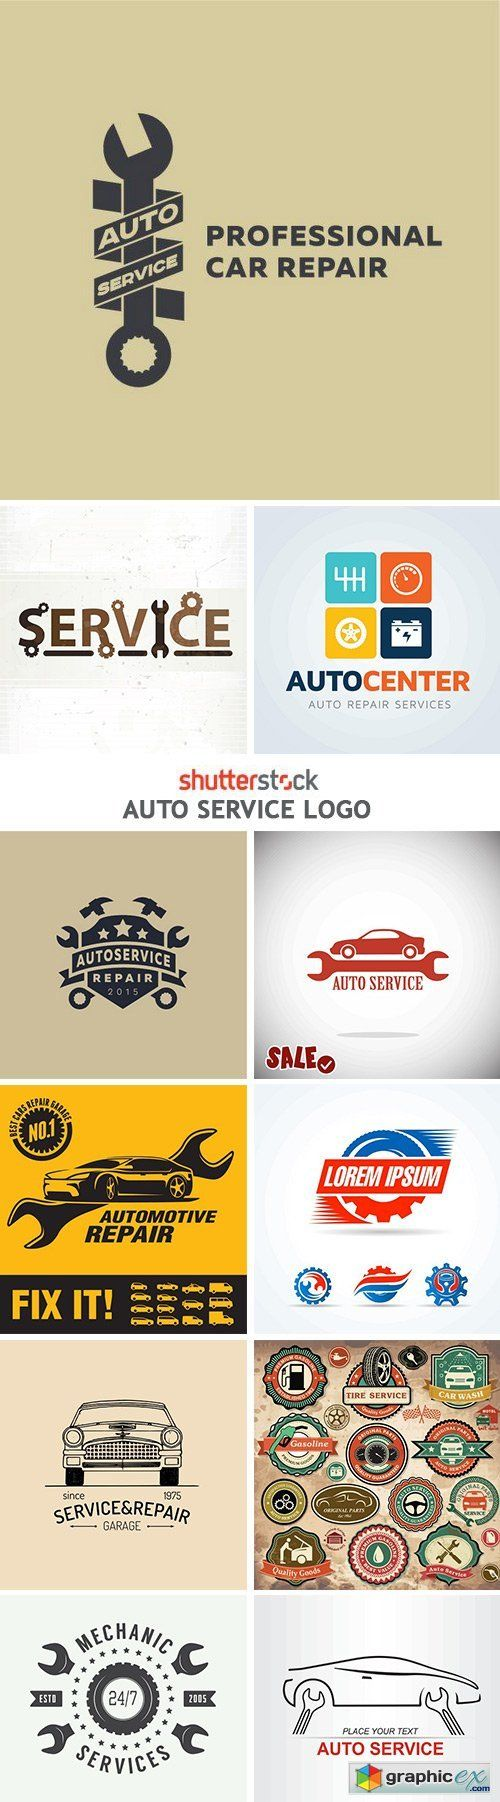 Auto Service Logo - 25xEPS http://www.healthydinneroptions.com/